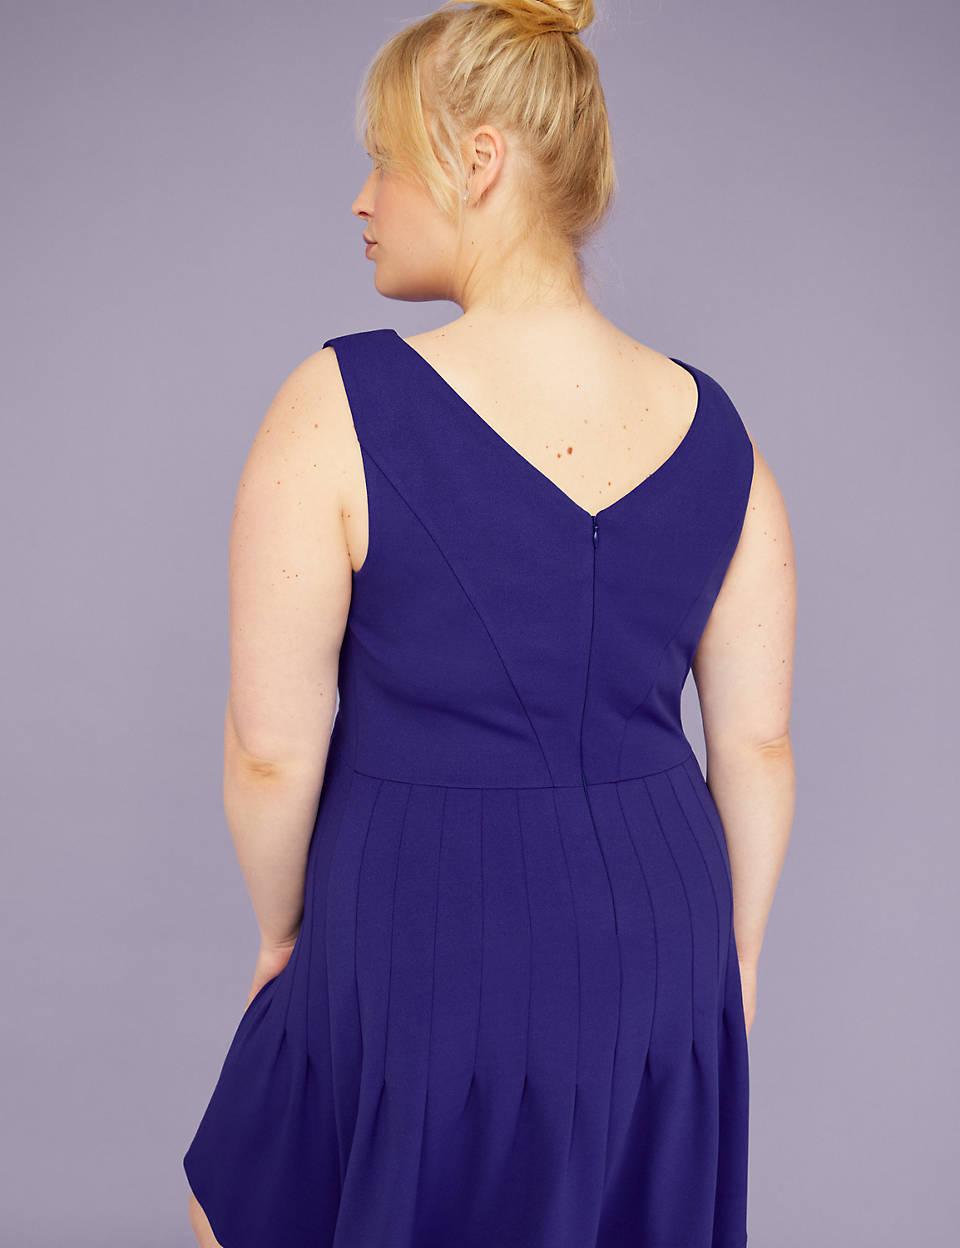 79937c736614 Fit And Flare Full Skirt Dress - raveitsafe